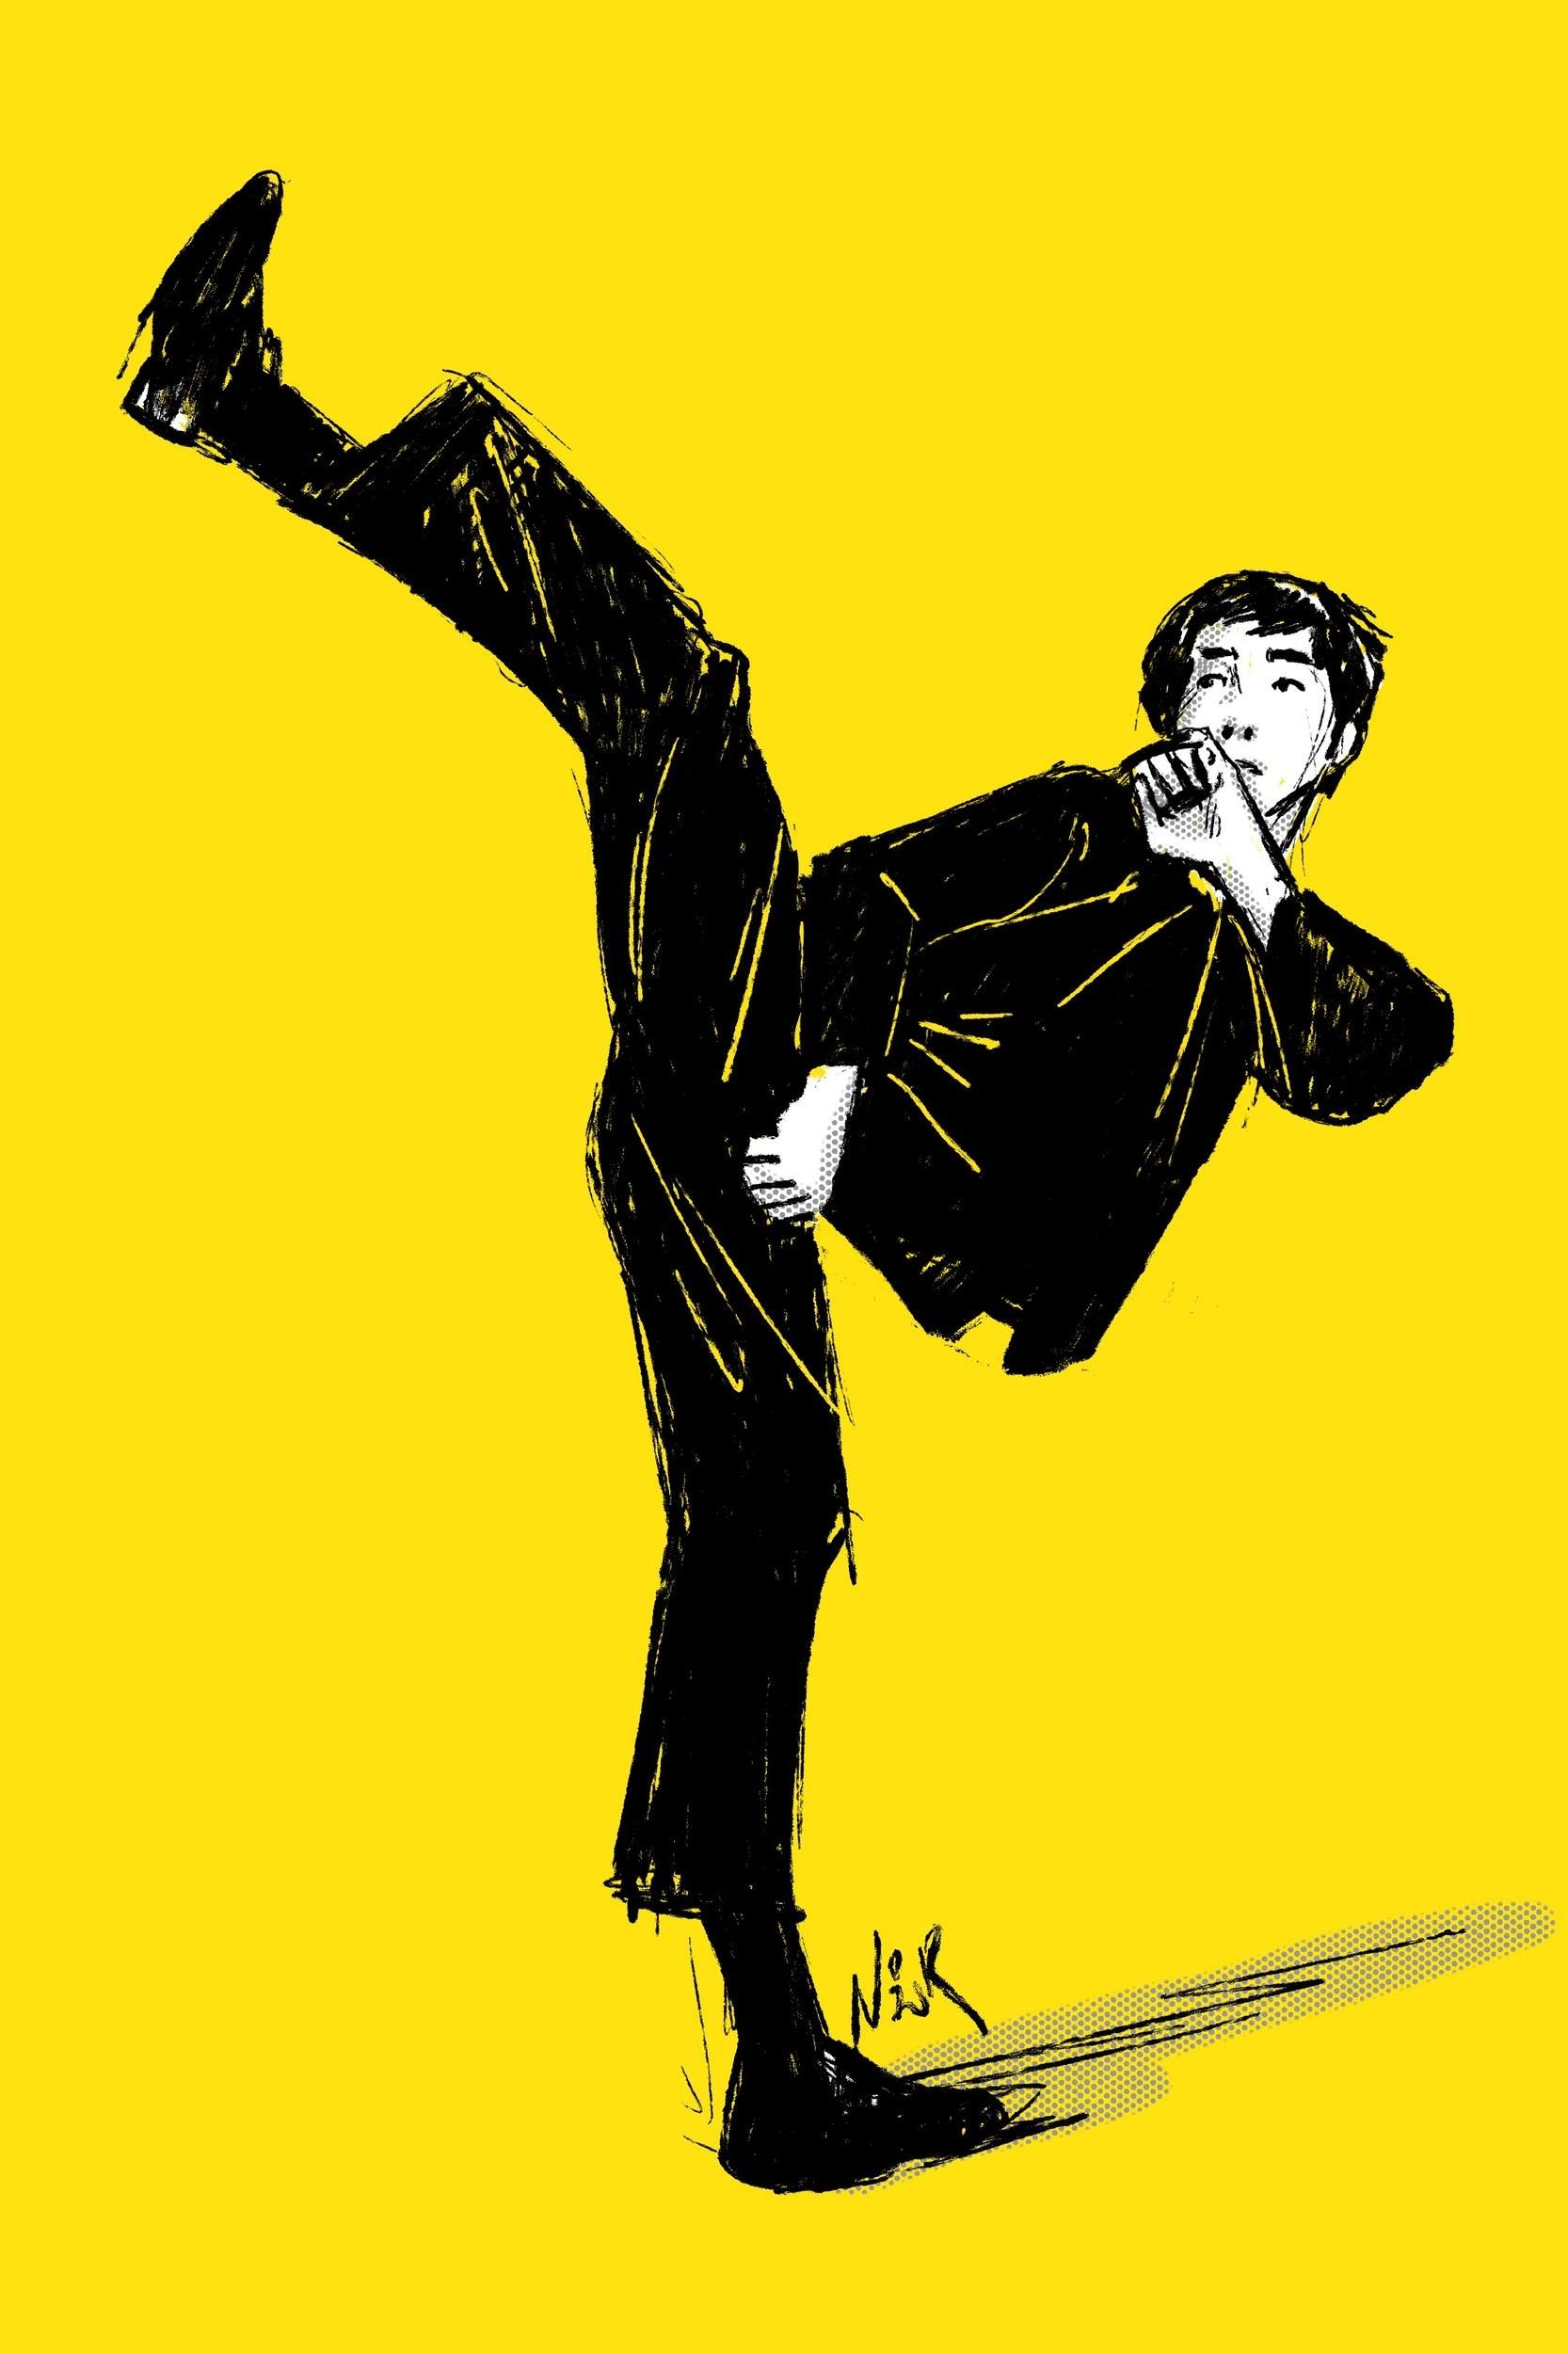 Bruce Lee doing a hook kick. Illustration by Nor Sanavongsay.